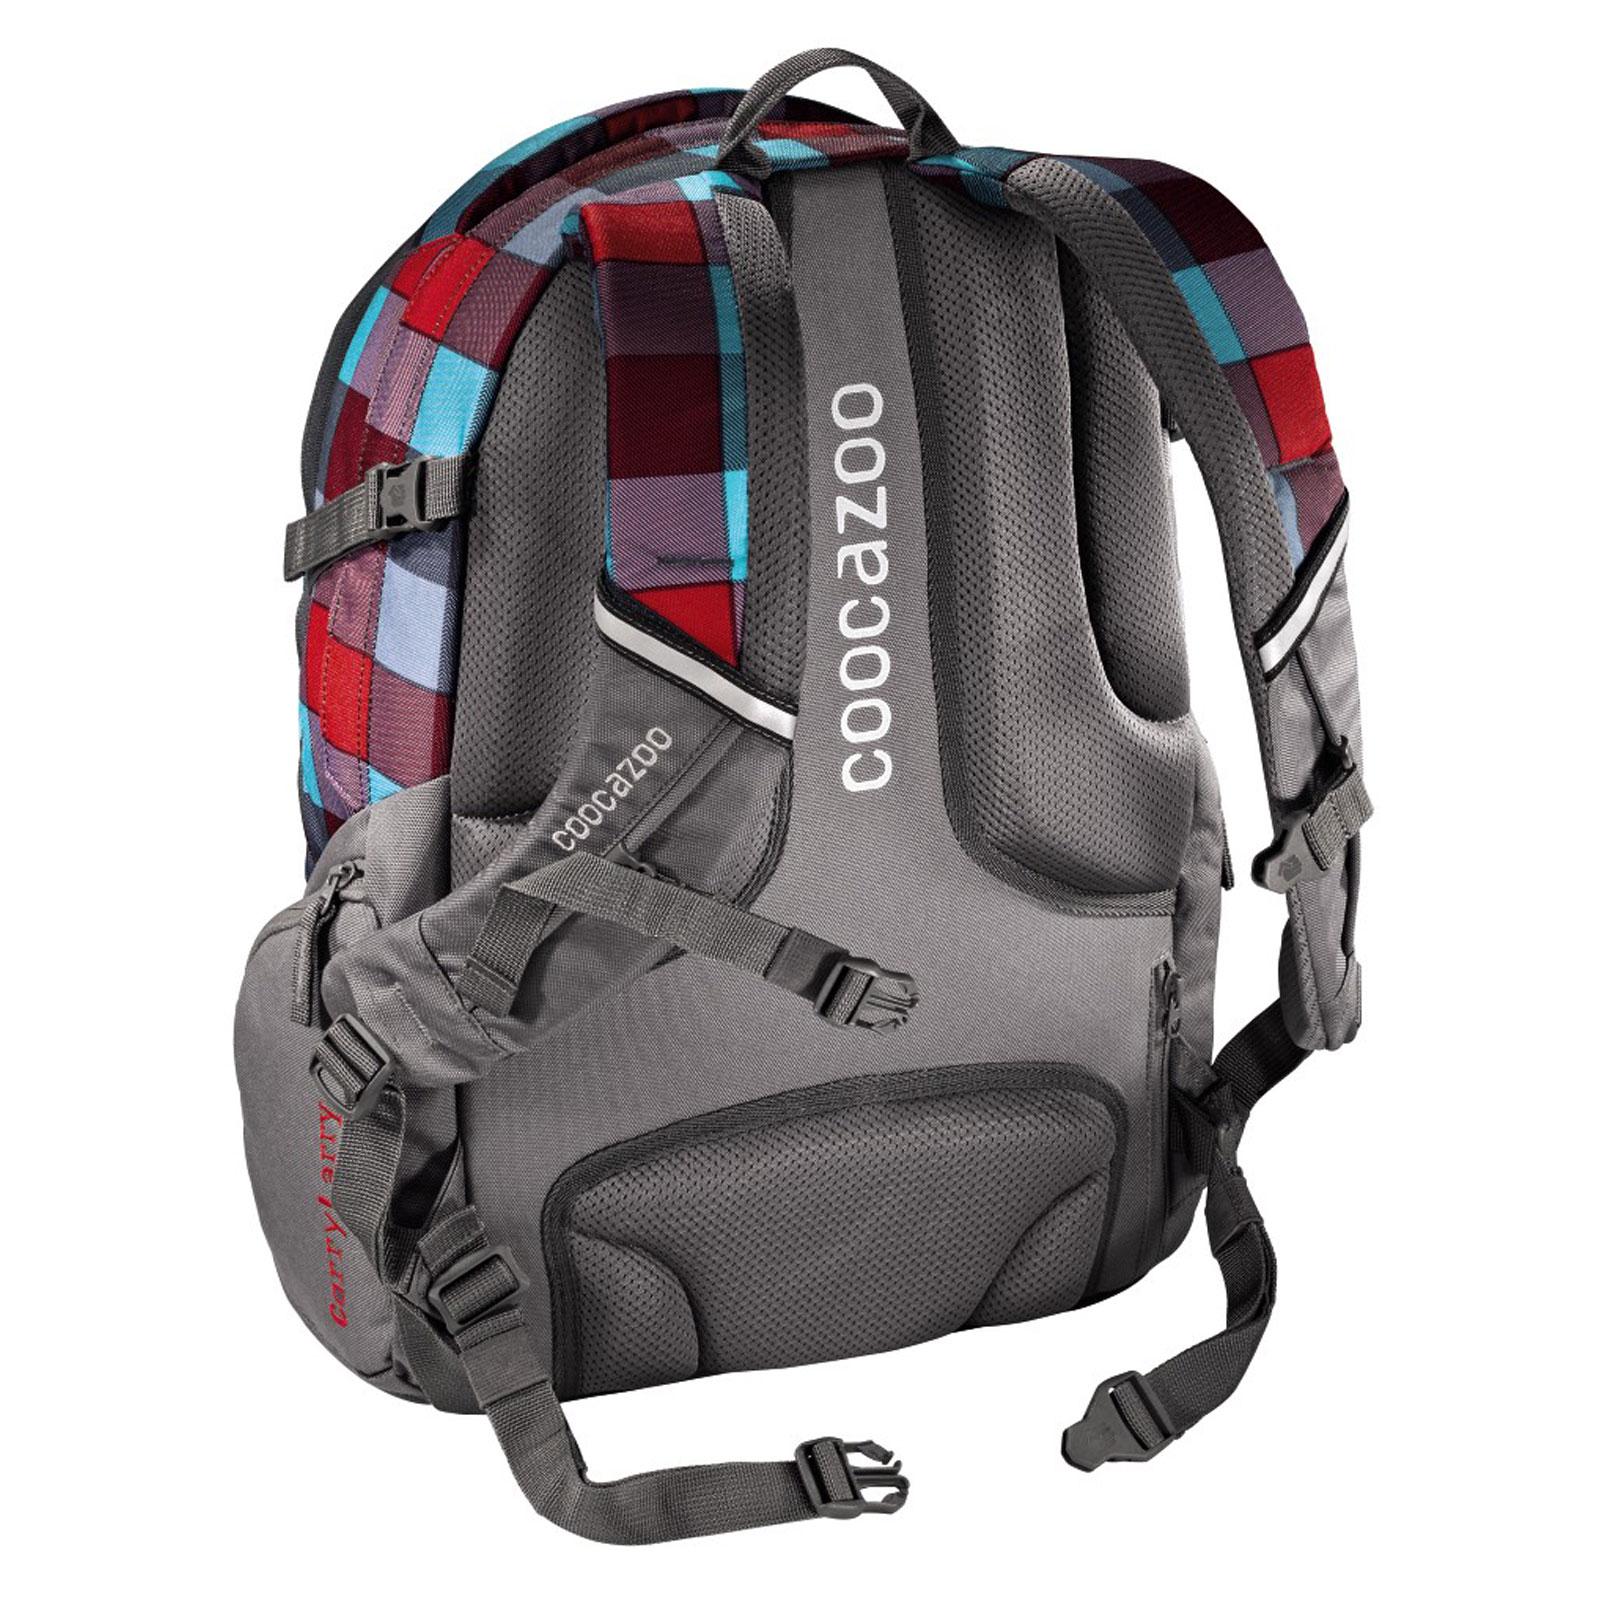 64d97bd29ec9c Coocazoo CarryLarry 2 Rucksack günstig kaufen